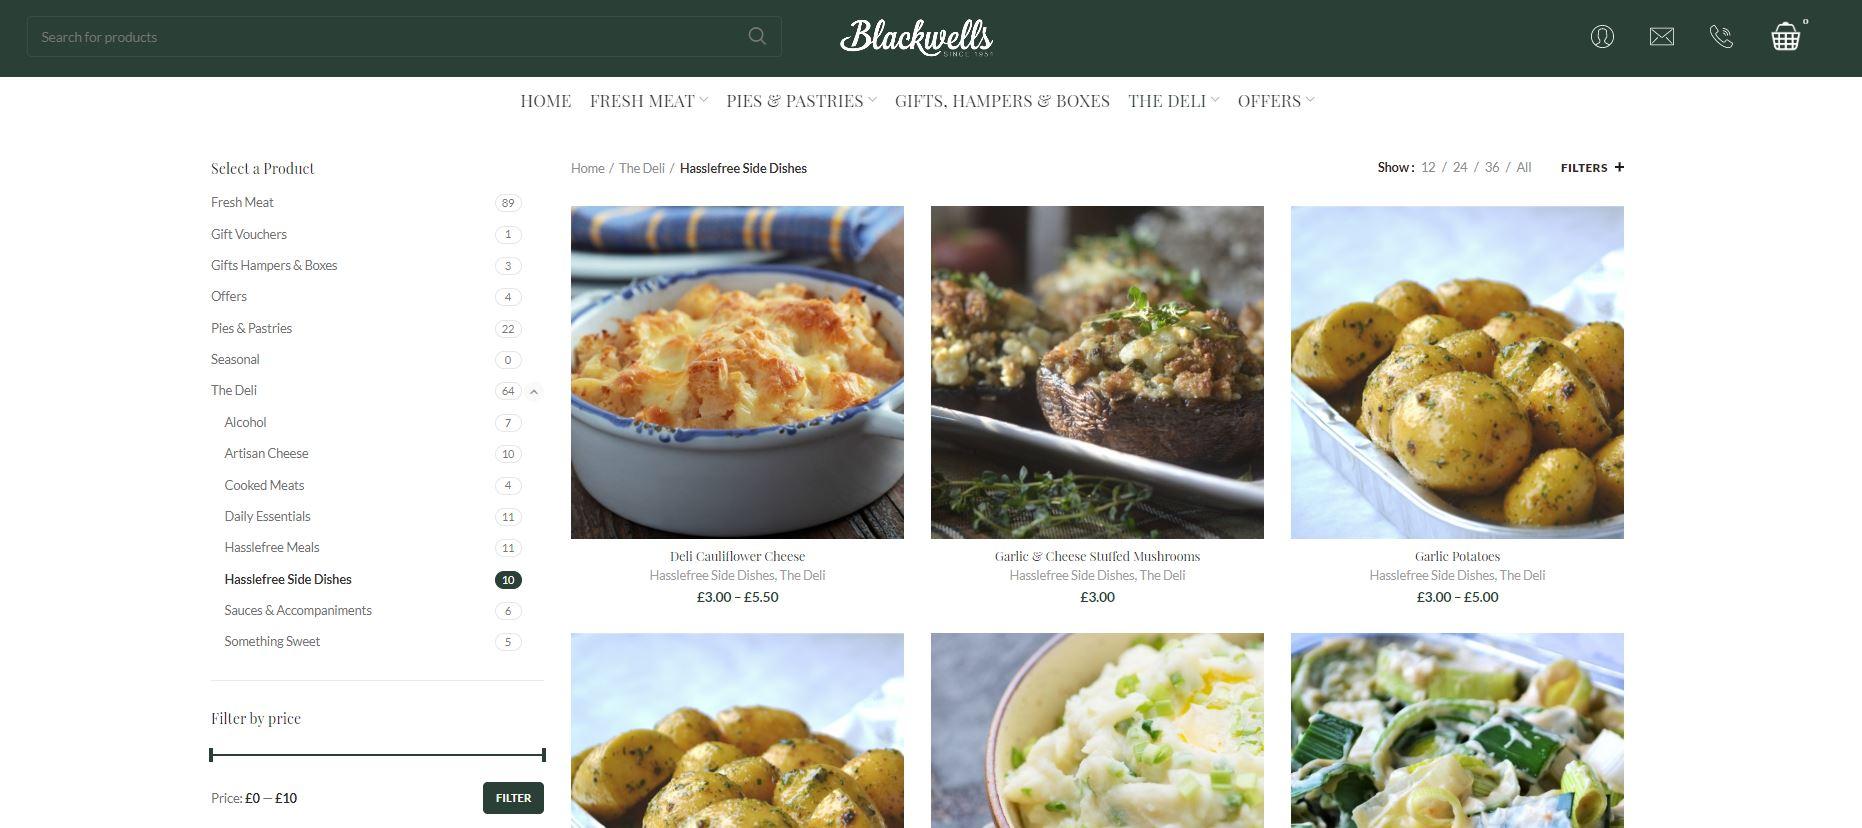 Blackwells website page